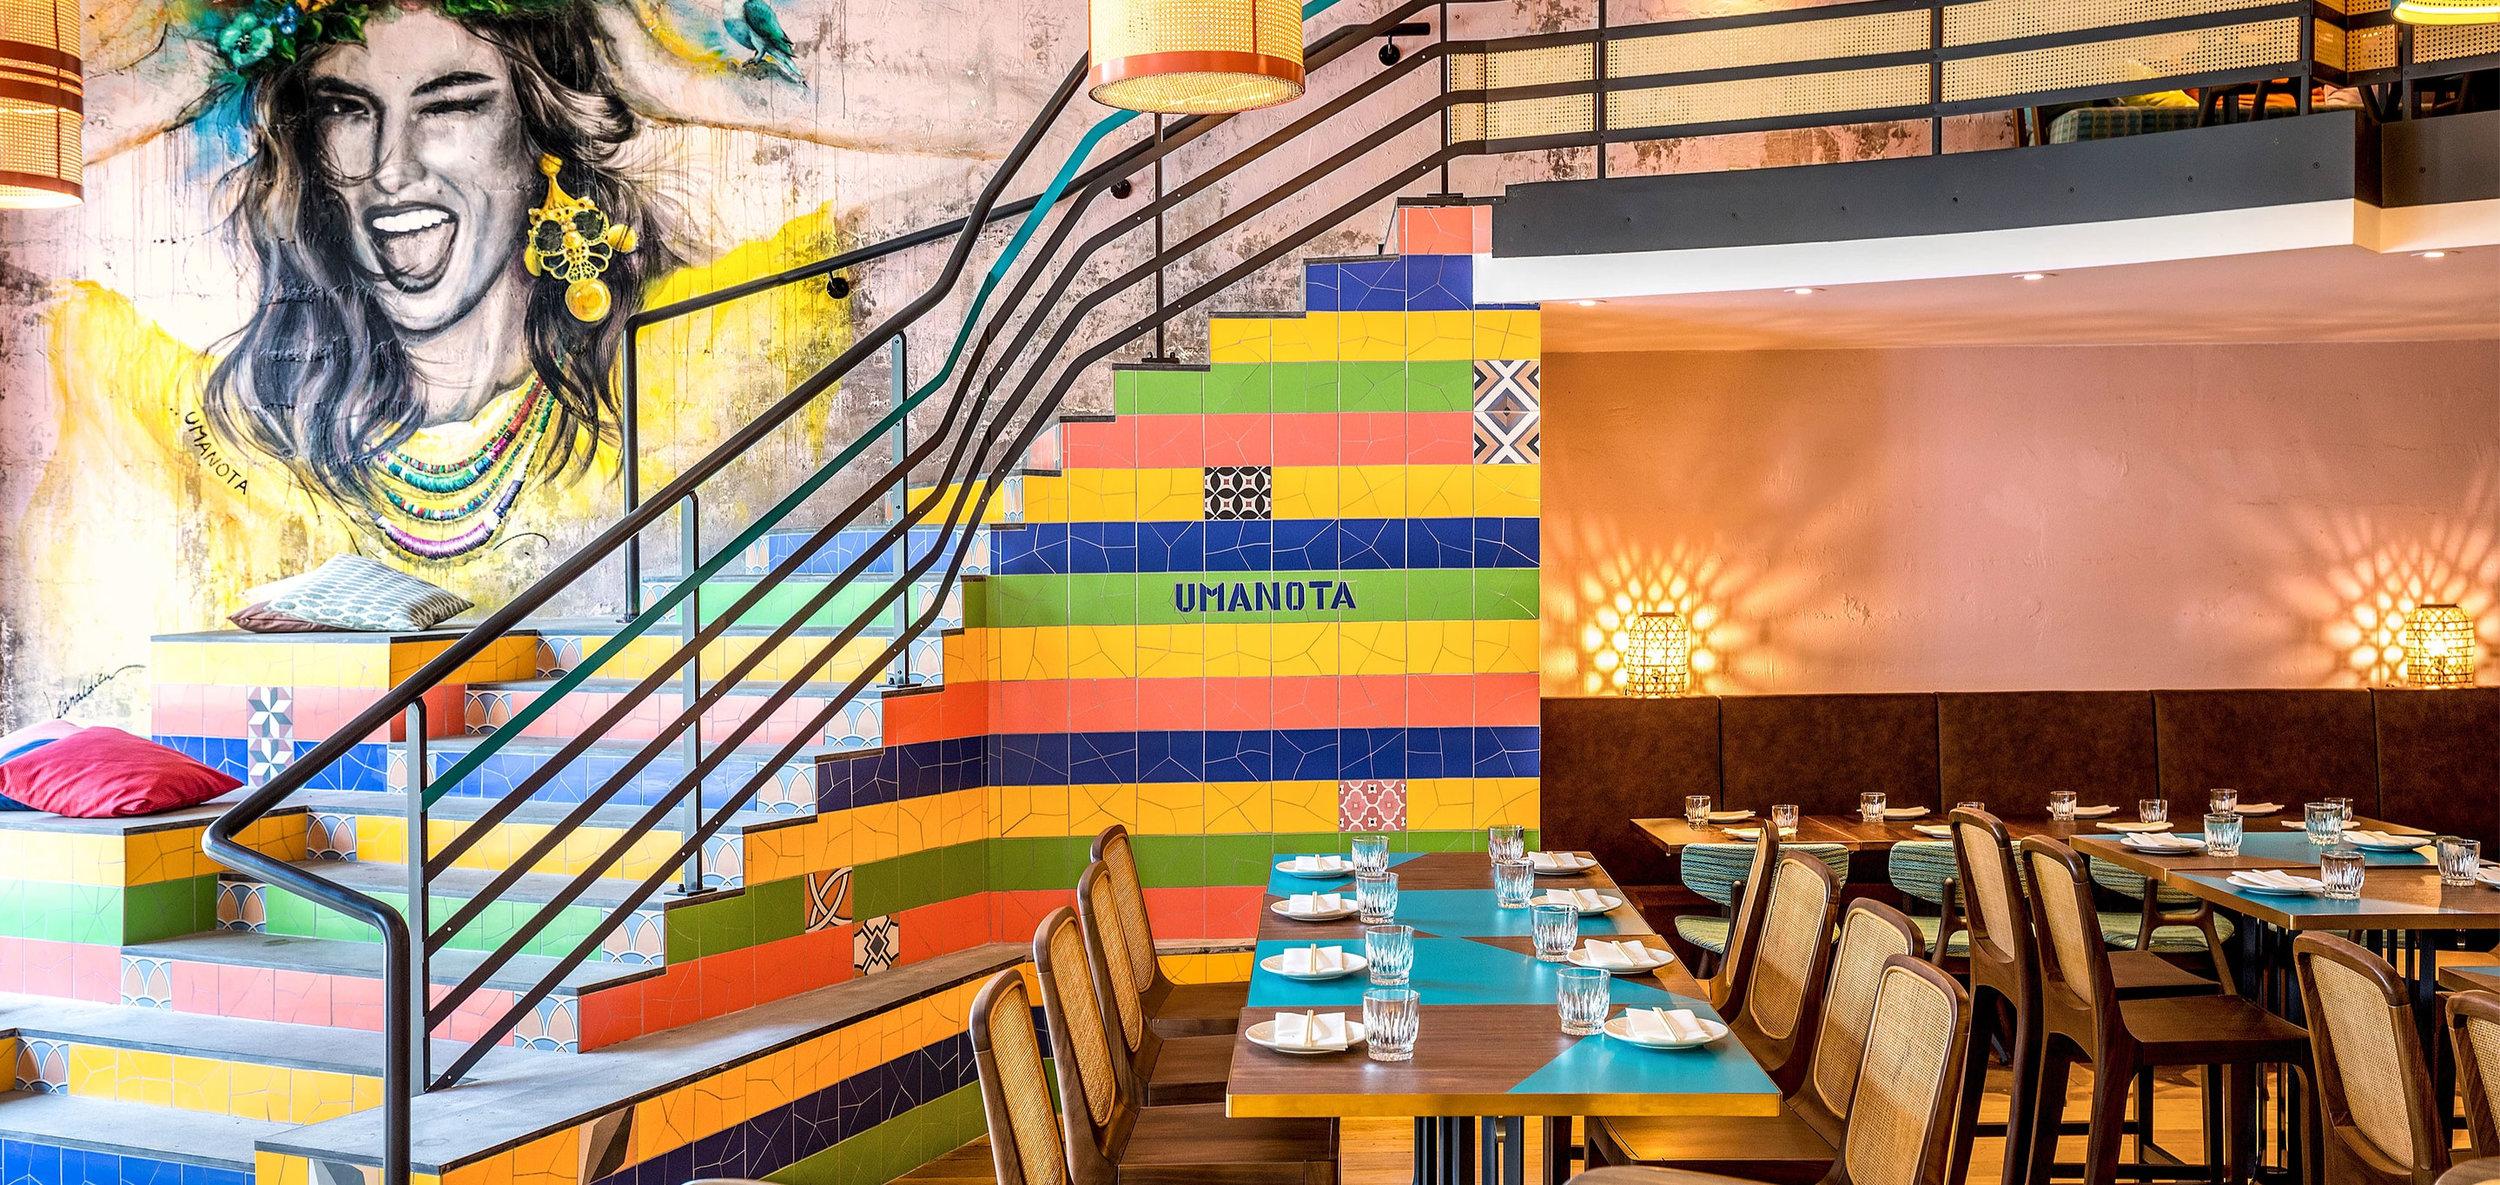 The_Ink_Collective_Inside_Ink_Pret_A_Partir_Paris_Restaurants_Eat_Uma Nota Paris_4.jpg